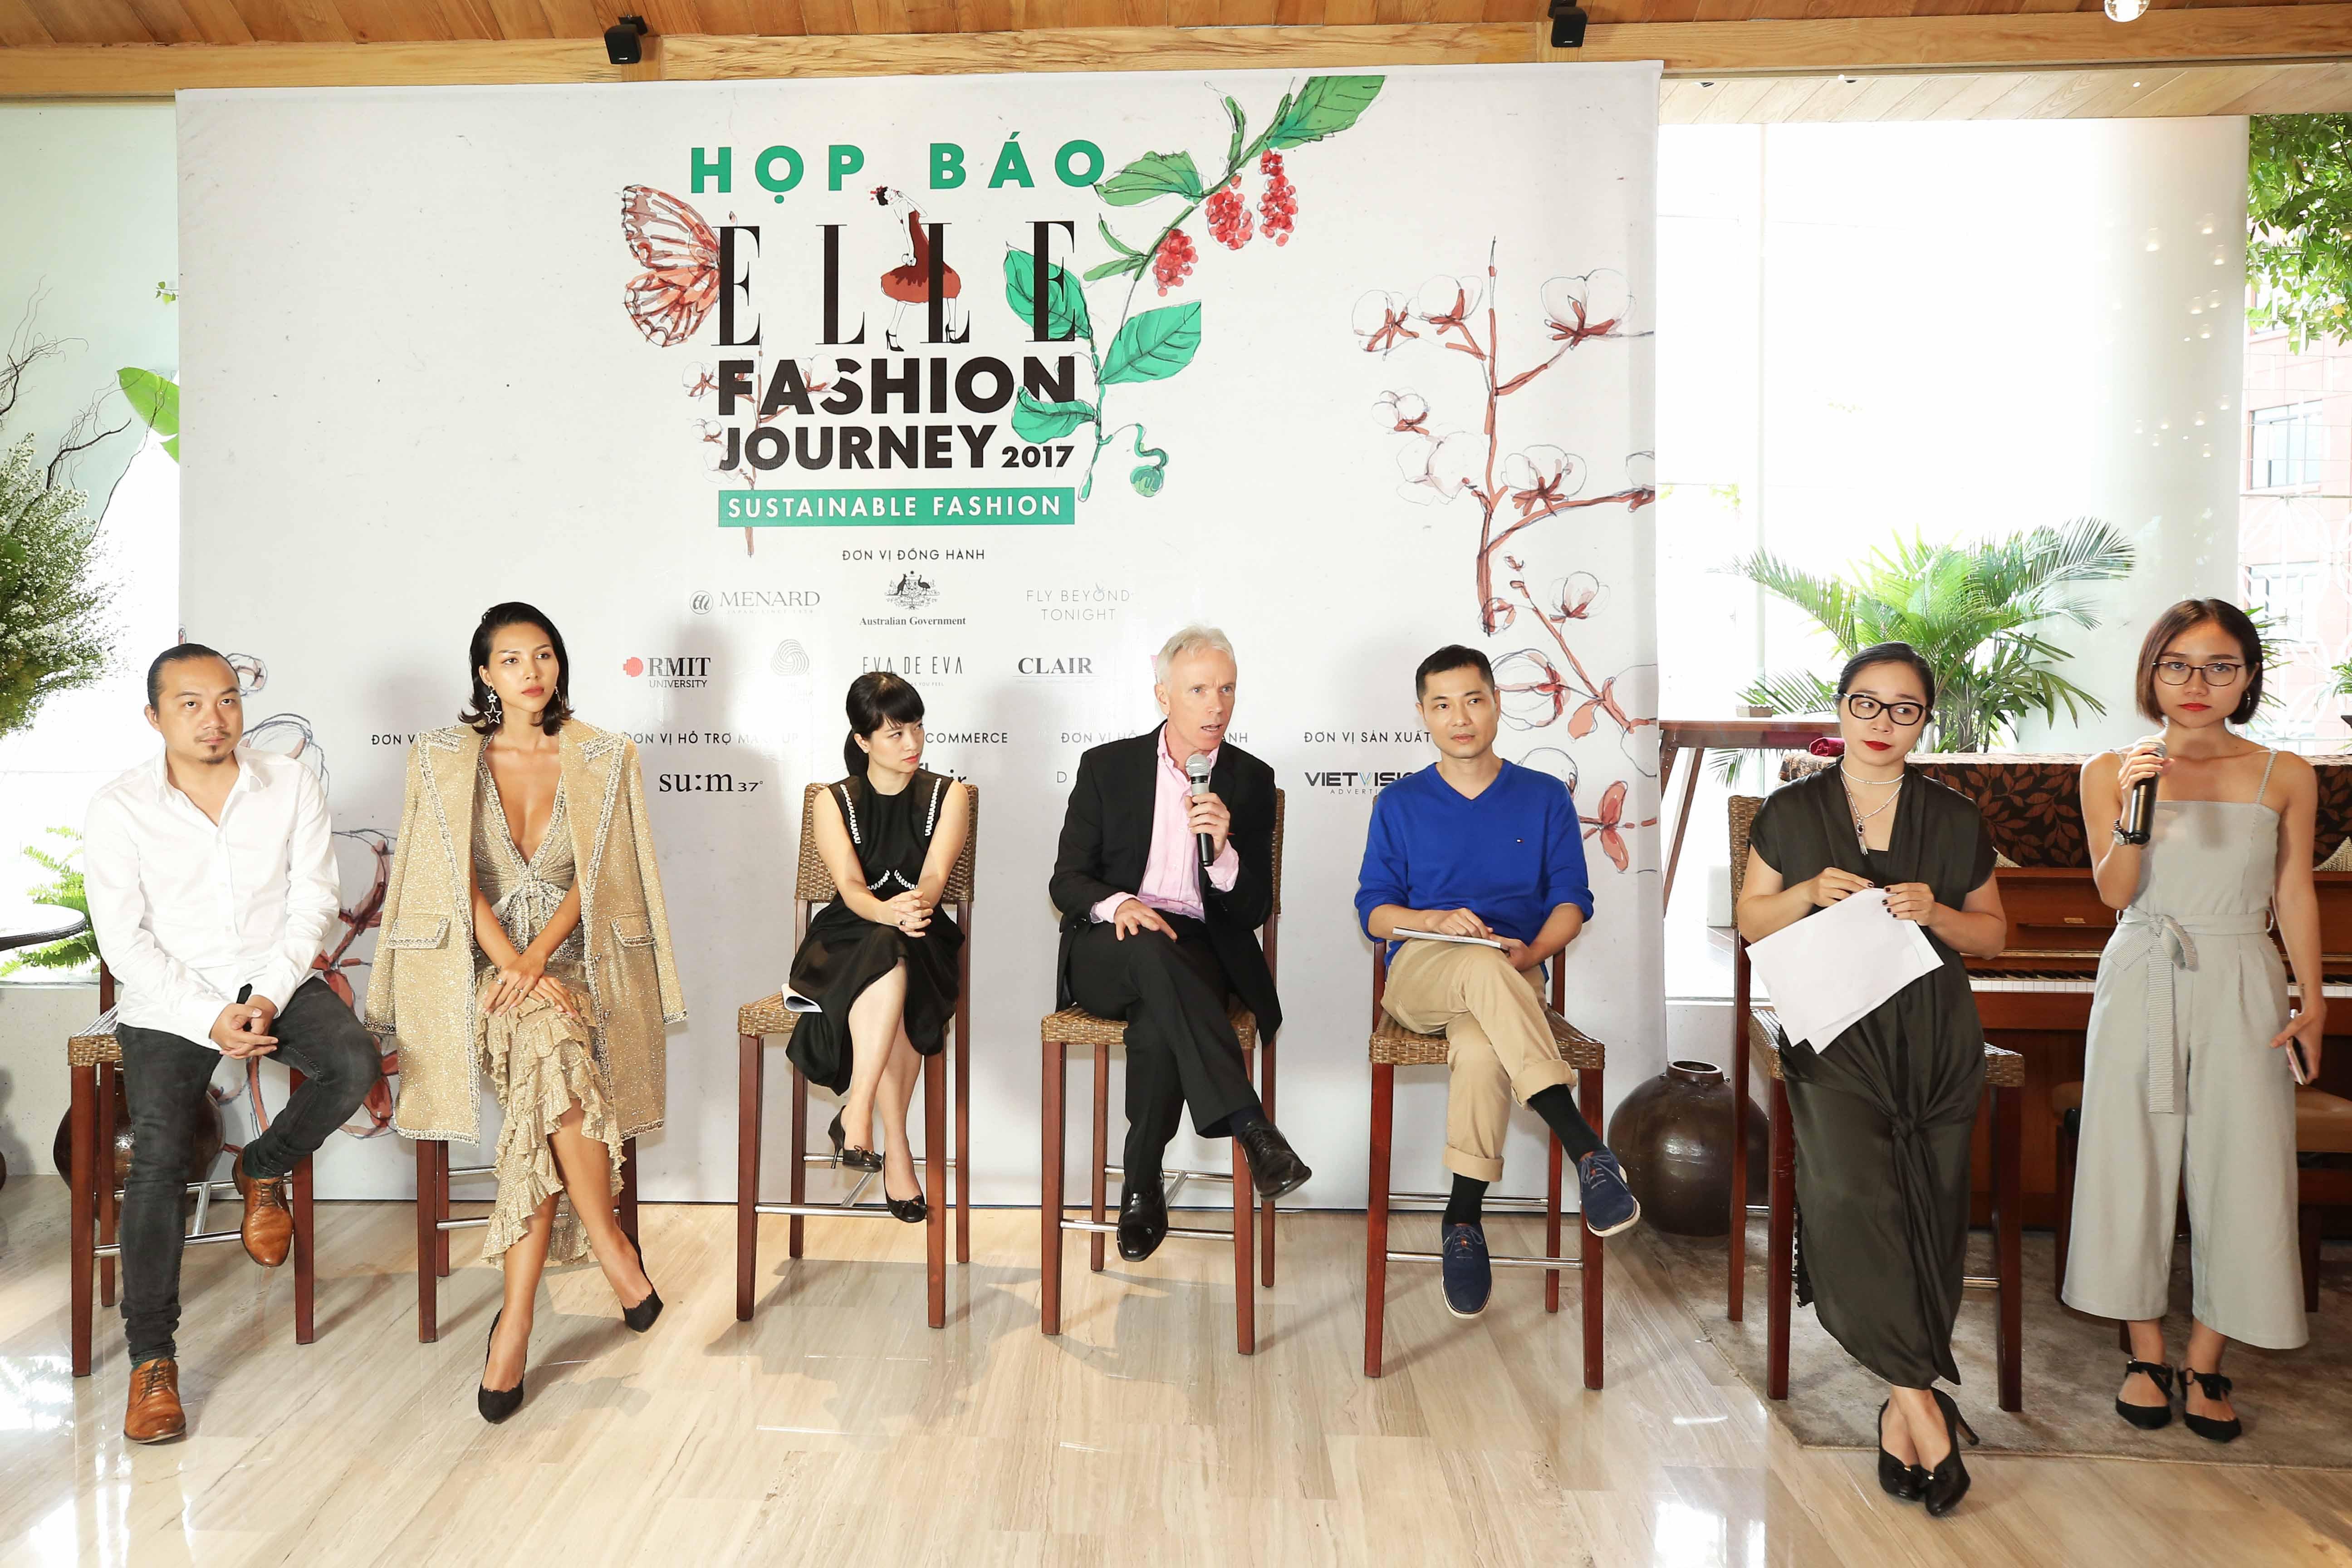 thời trang bền vững